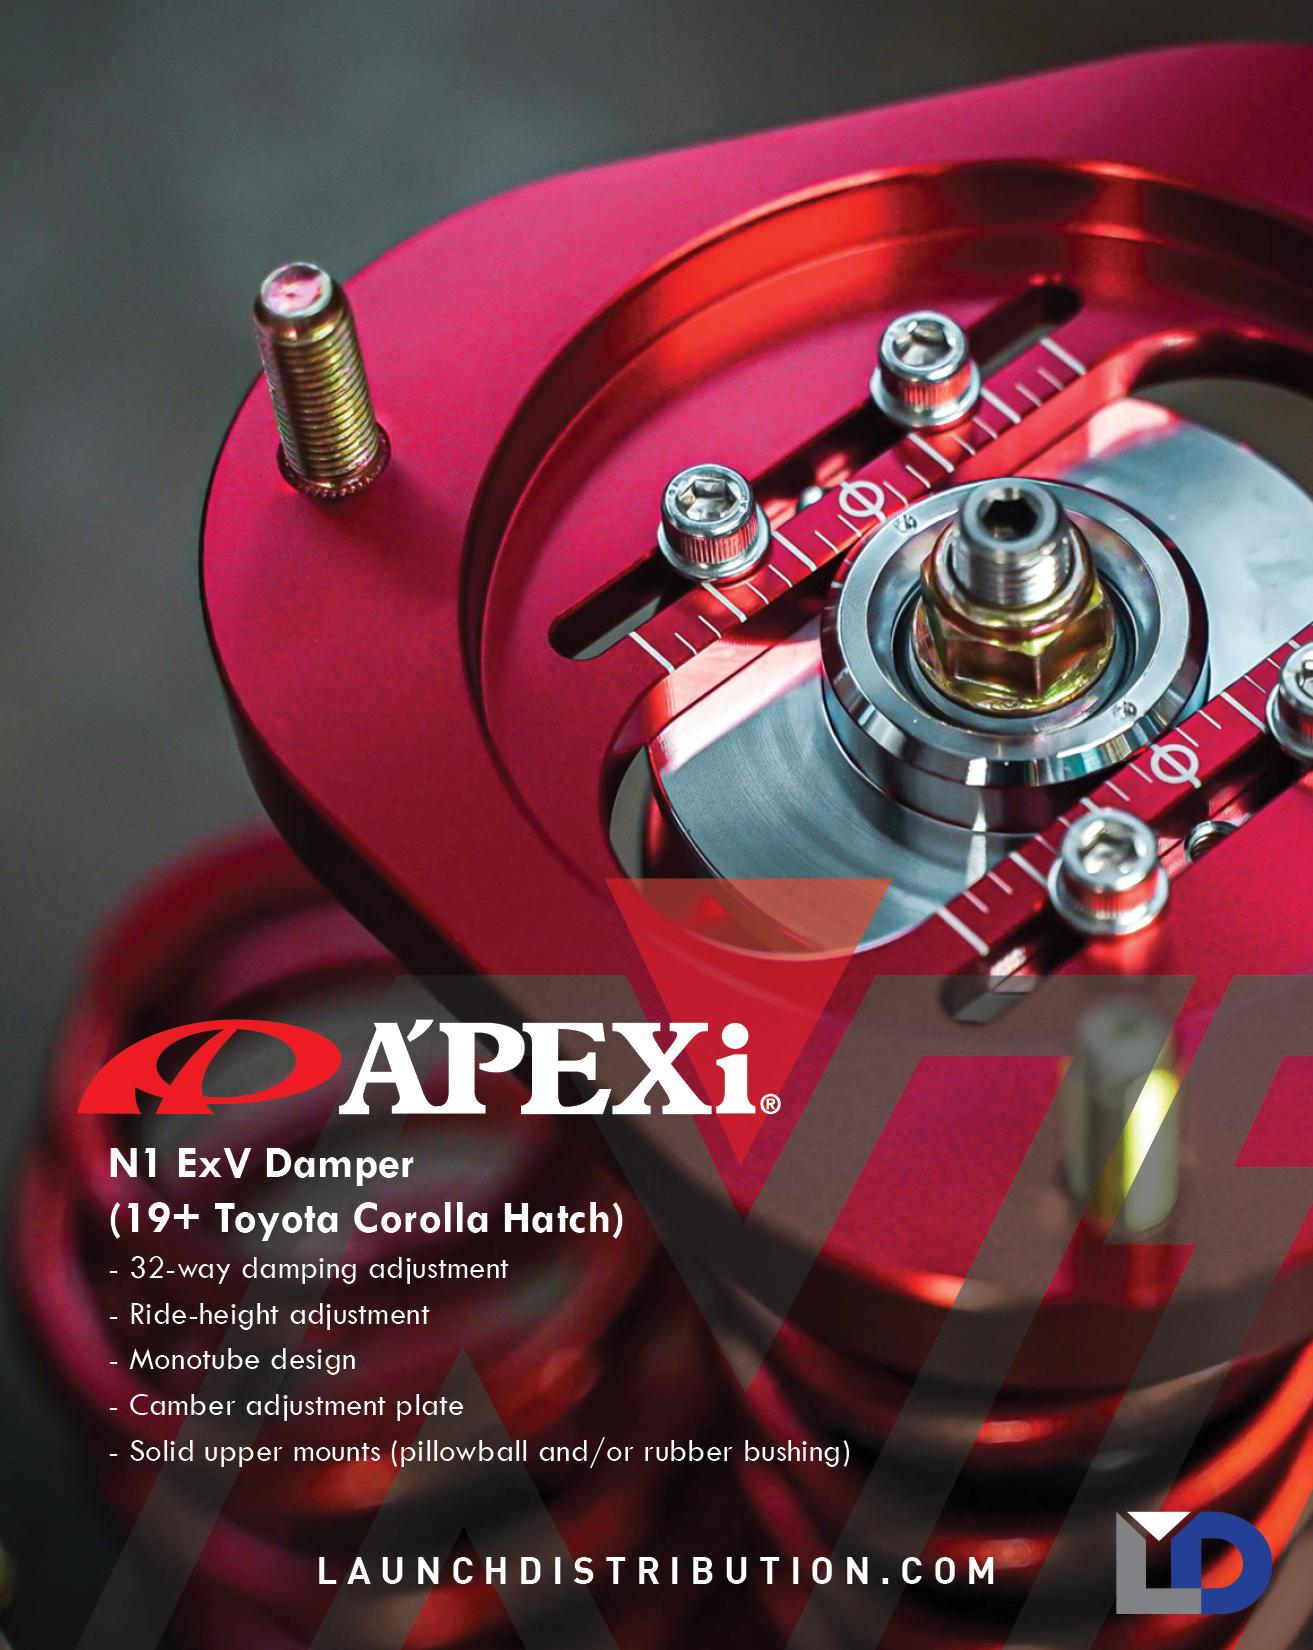 A'PEXi N1 ExV Damper for 17+ Toyota Corolla Hatchback